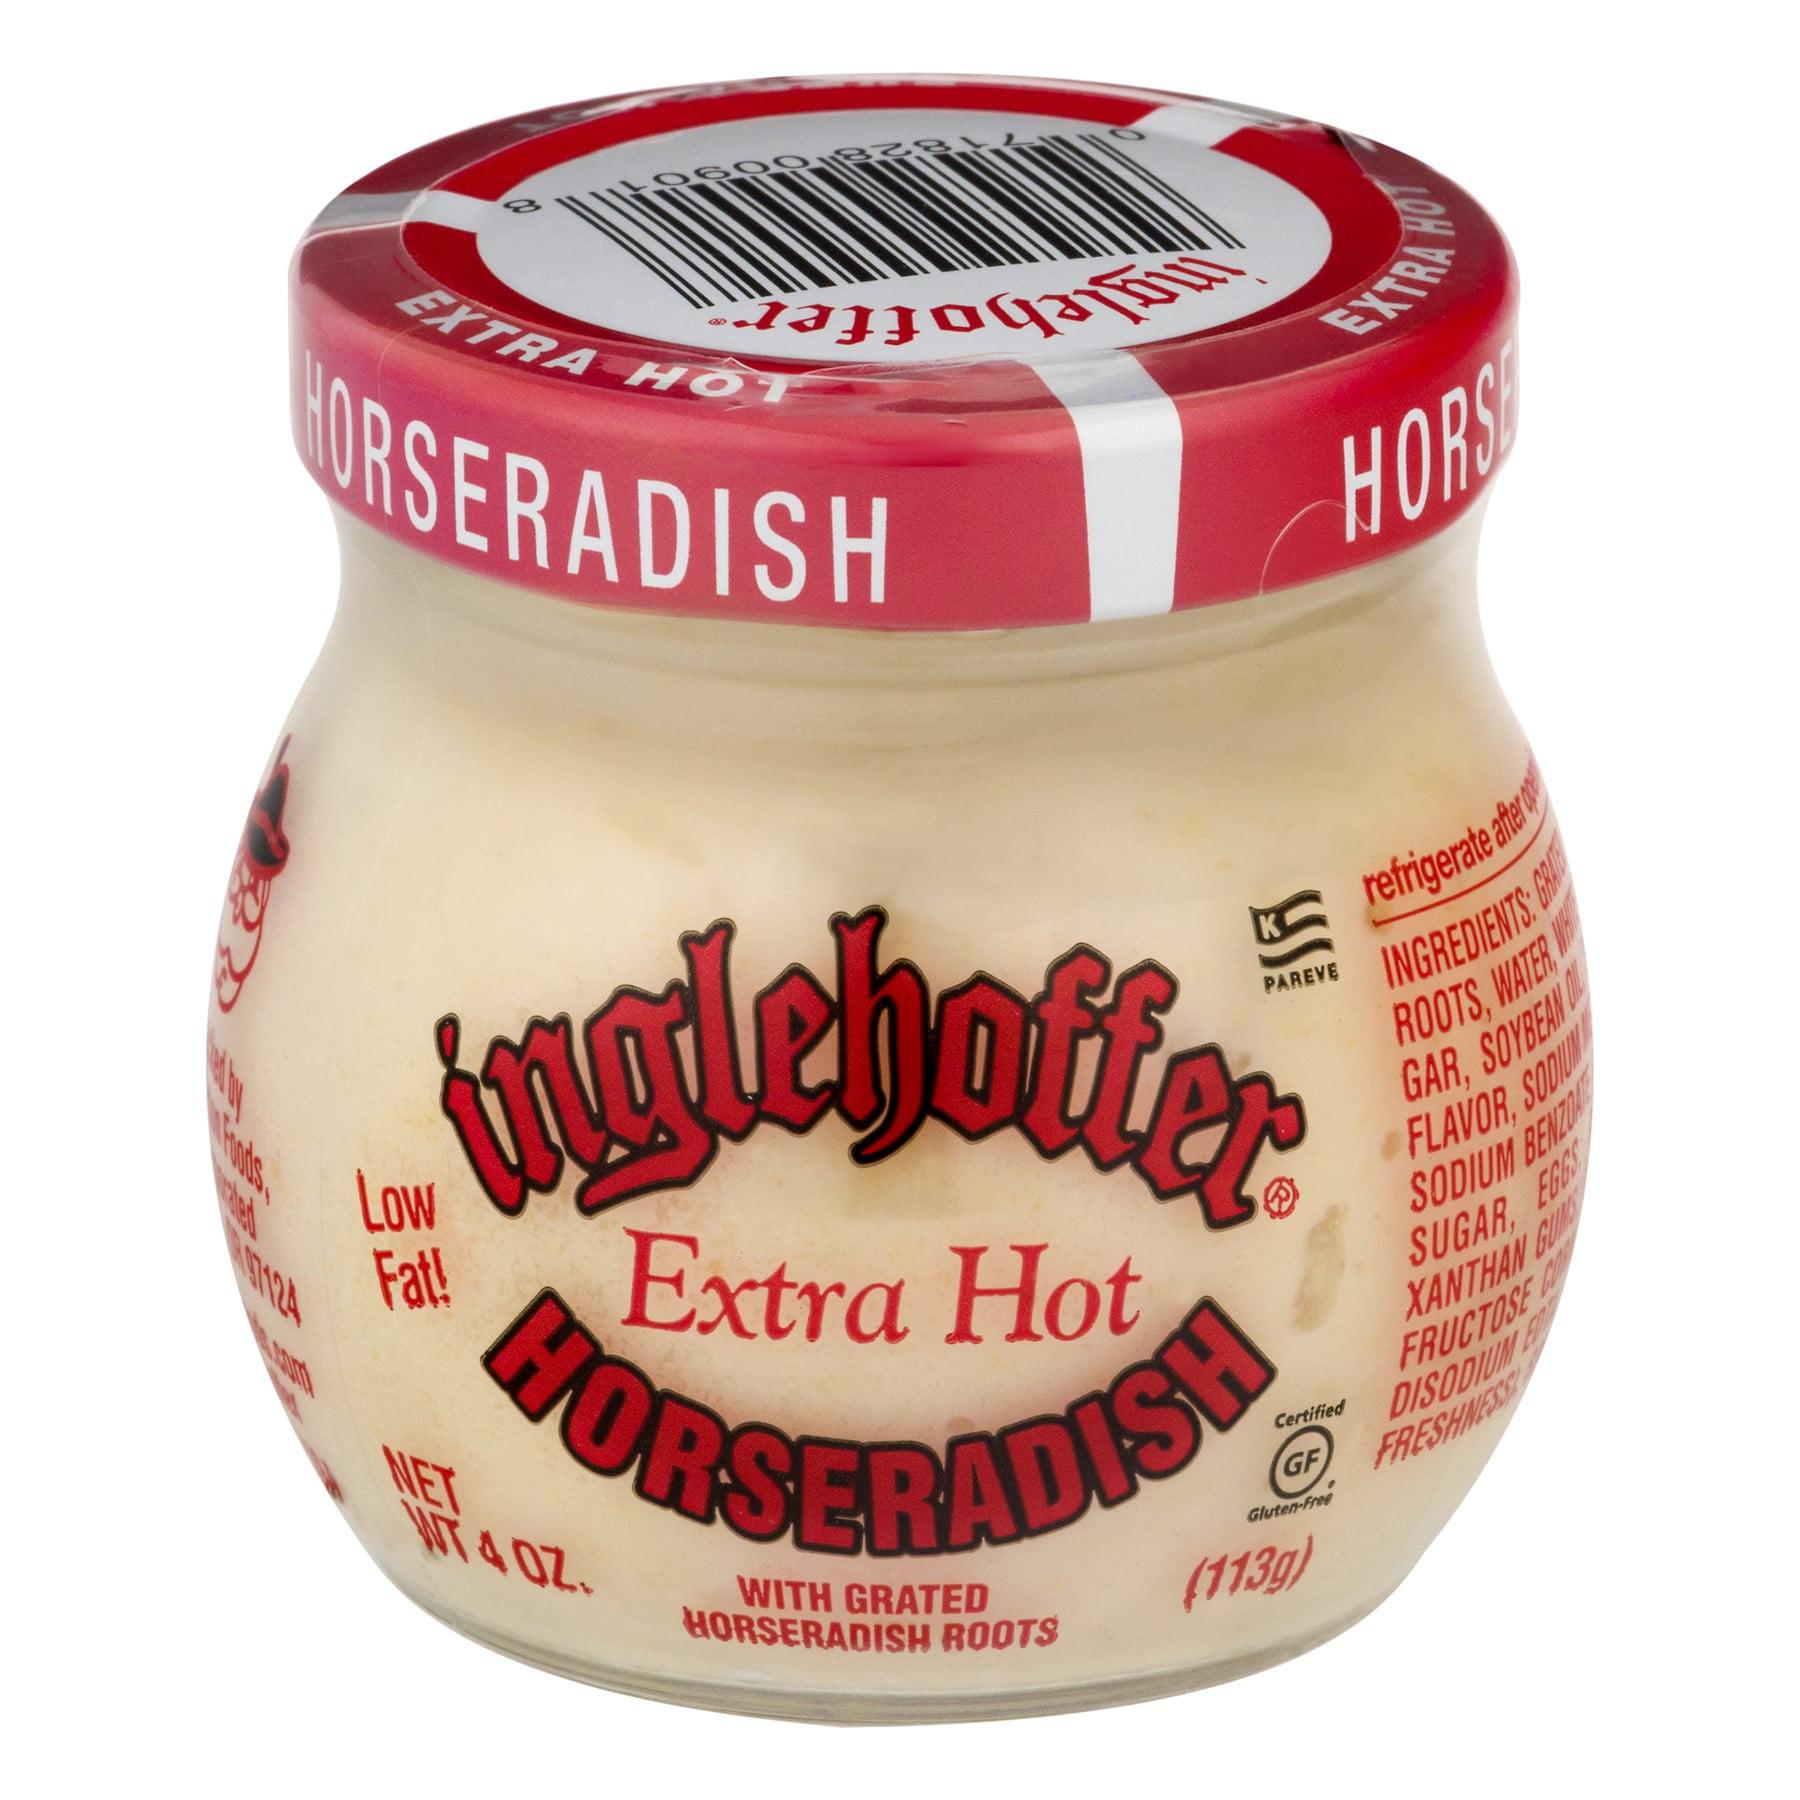 Inglehoffer Horseradish, Extra Hot, 4 Oz Jar